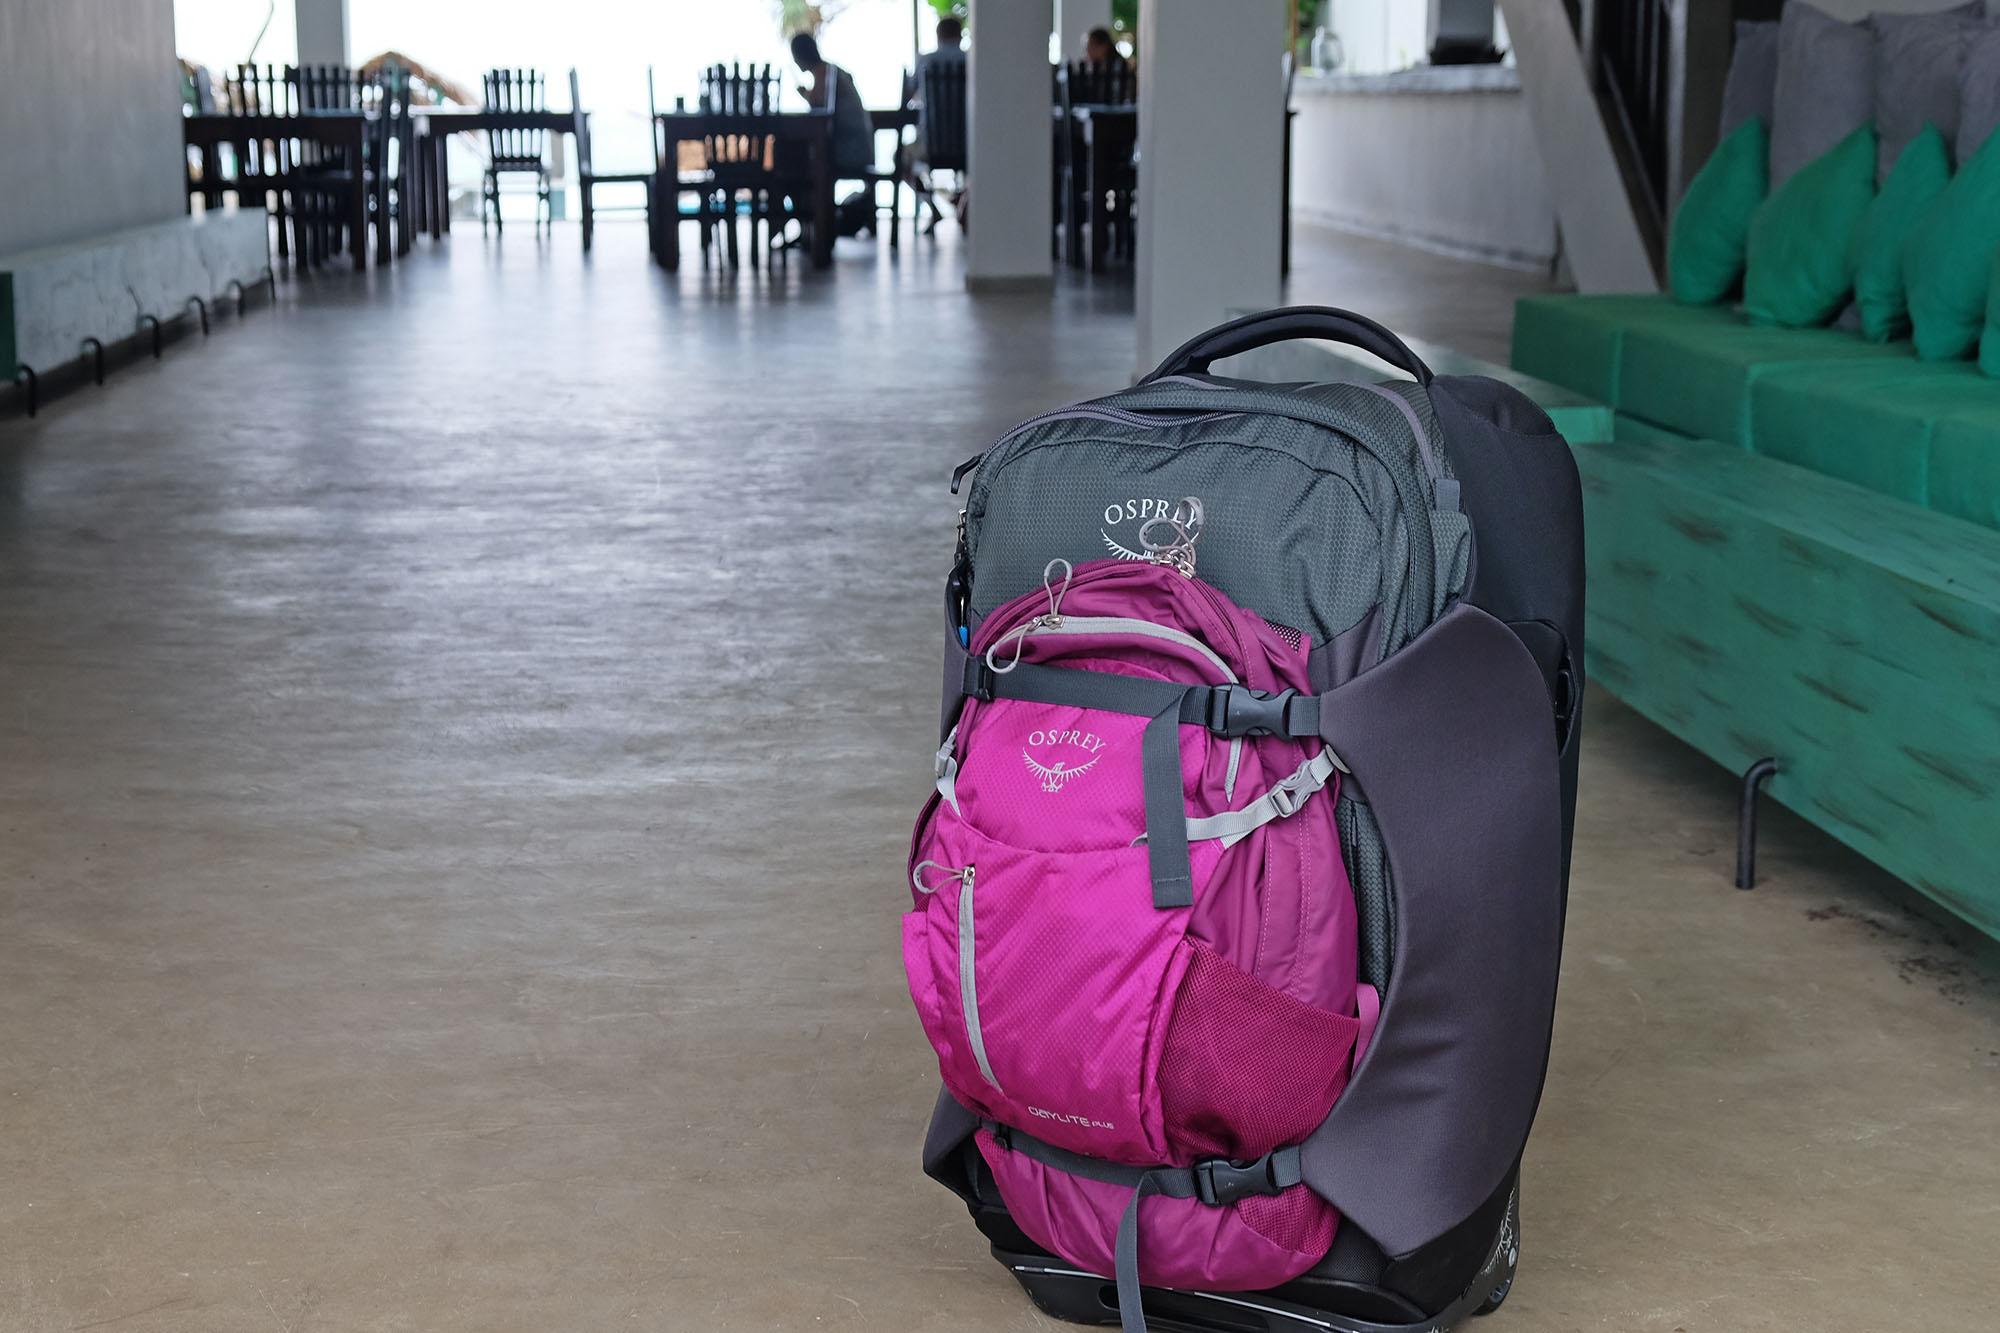 Osrpey reisesekk - Sojourn 60 og Daylite Plus